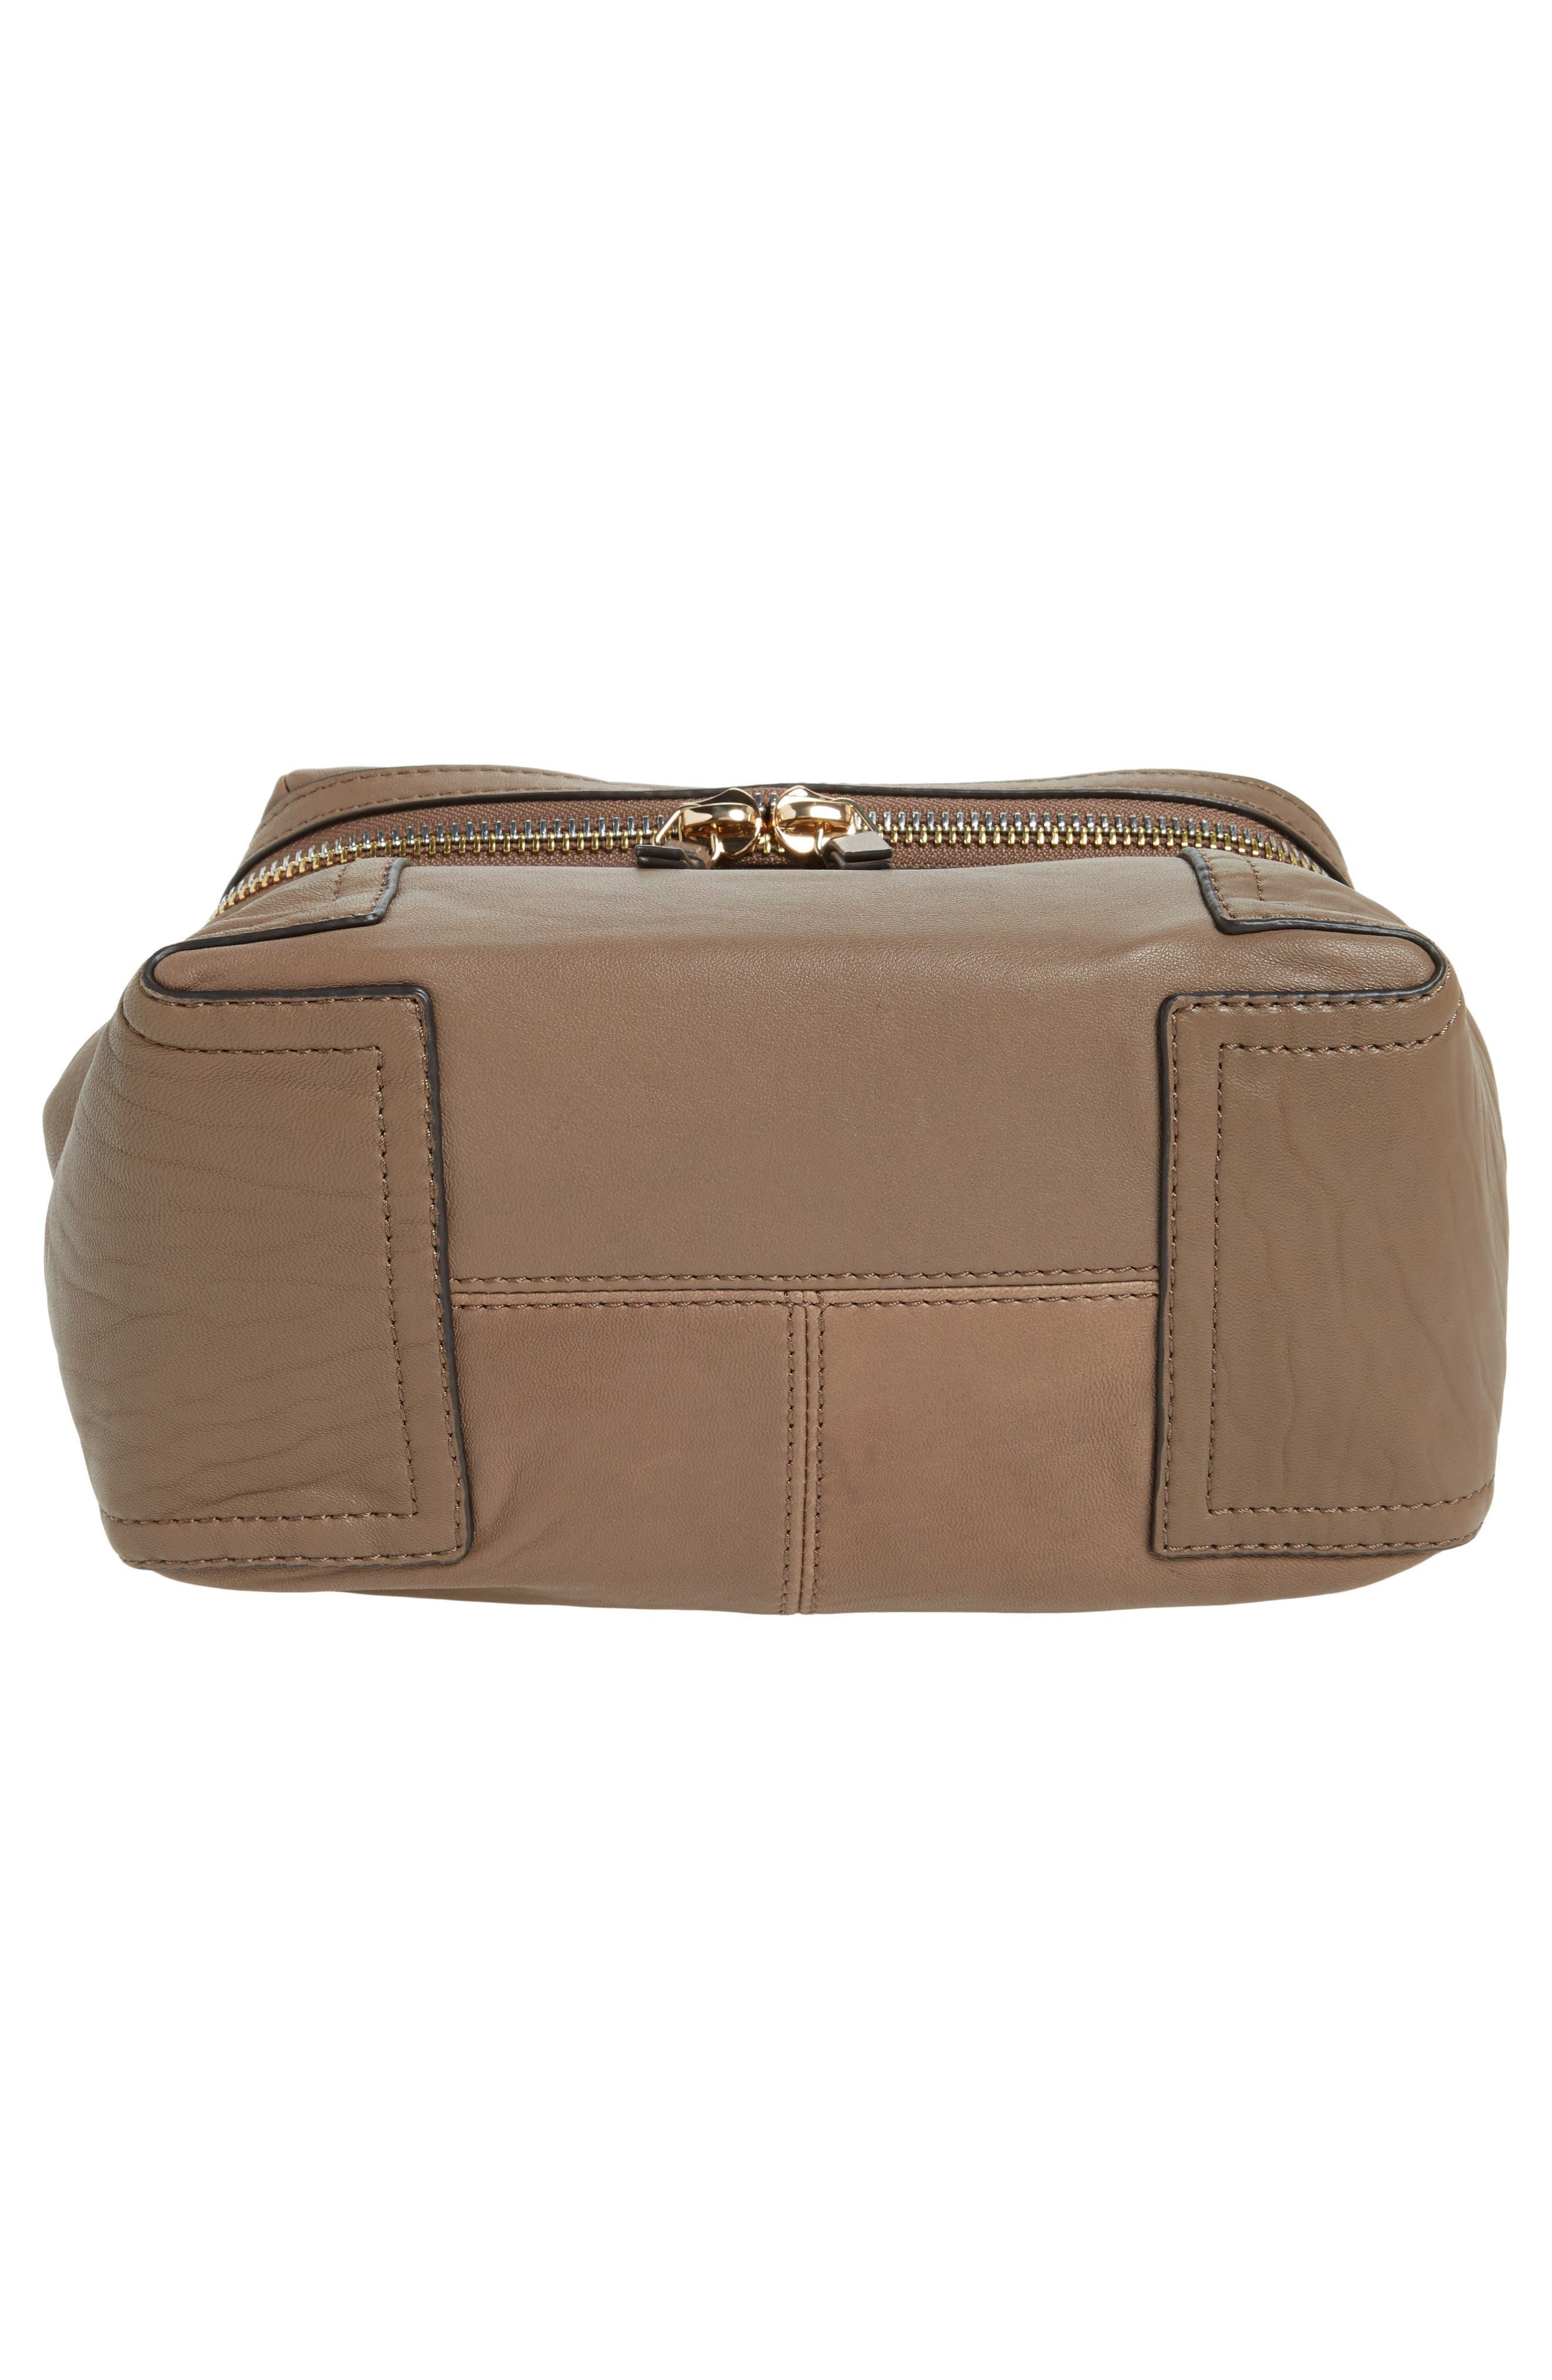 Medium Patch Leather Crossbody Bag,                             Alternate thumbnail 12, color,